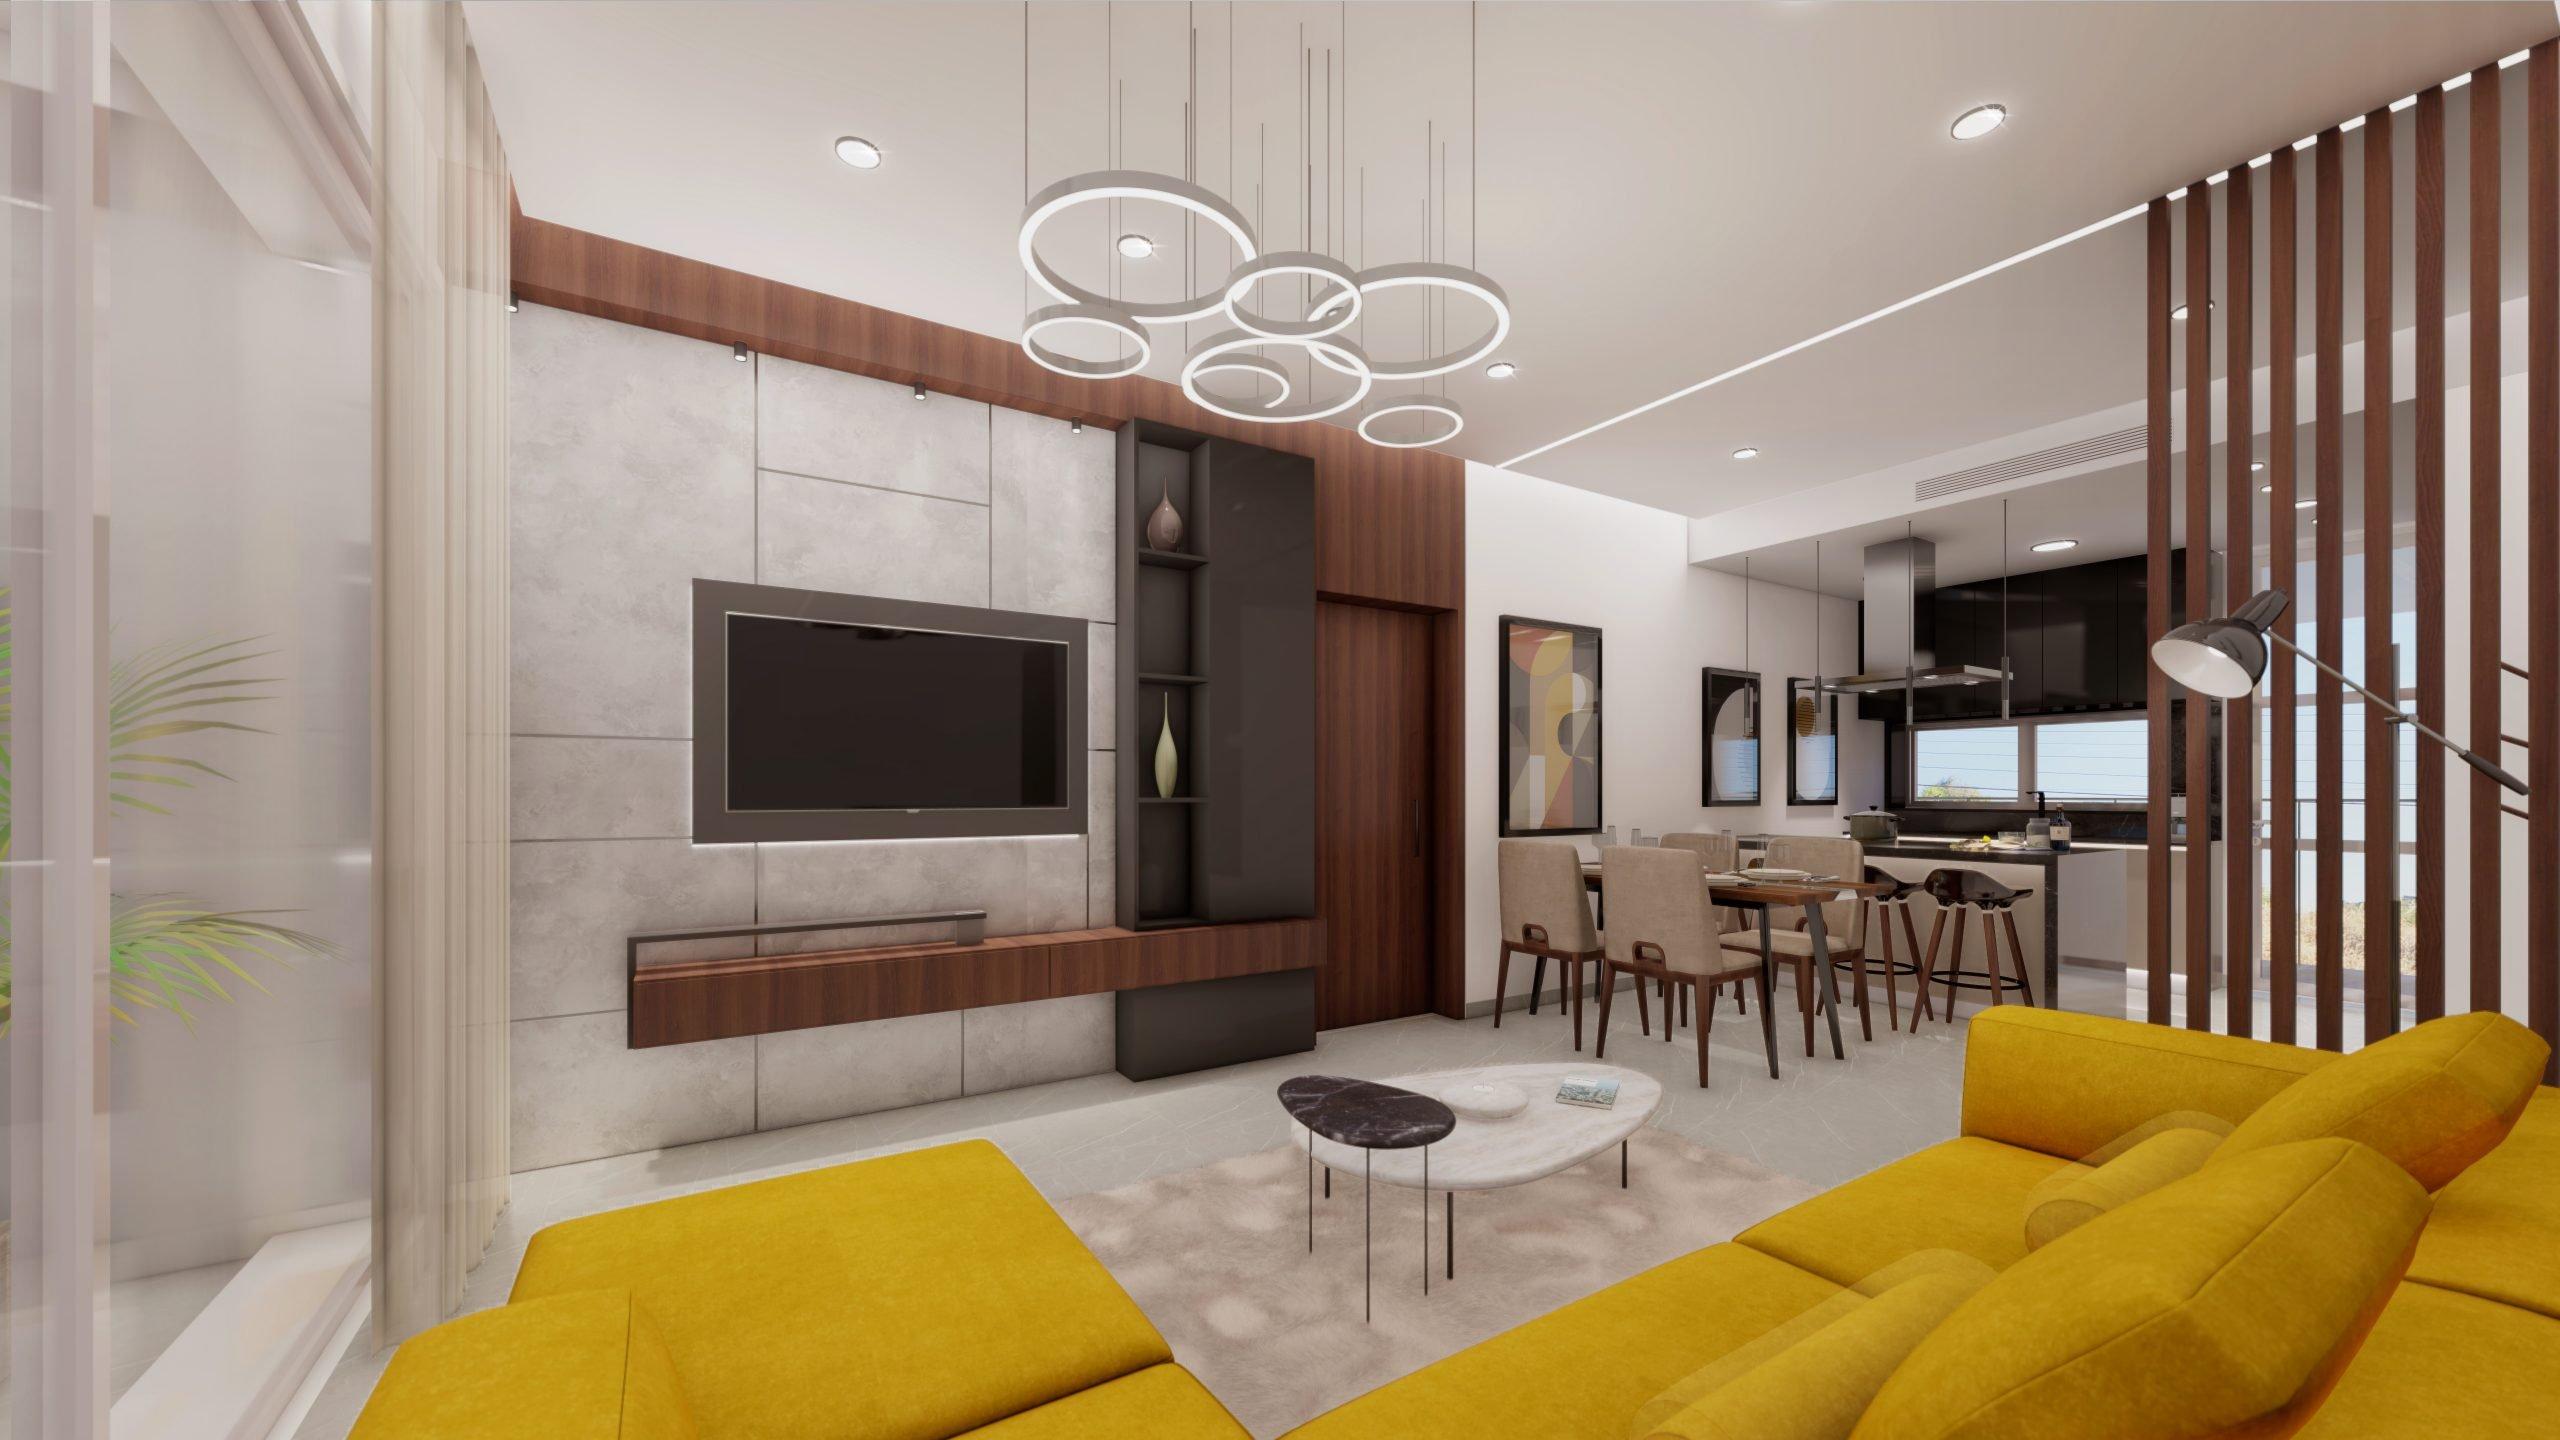 Living Room & Kitchen_3 - Living room & Kitchen